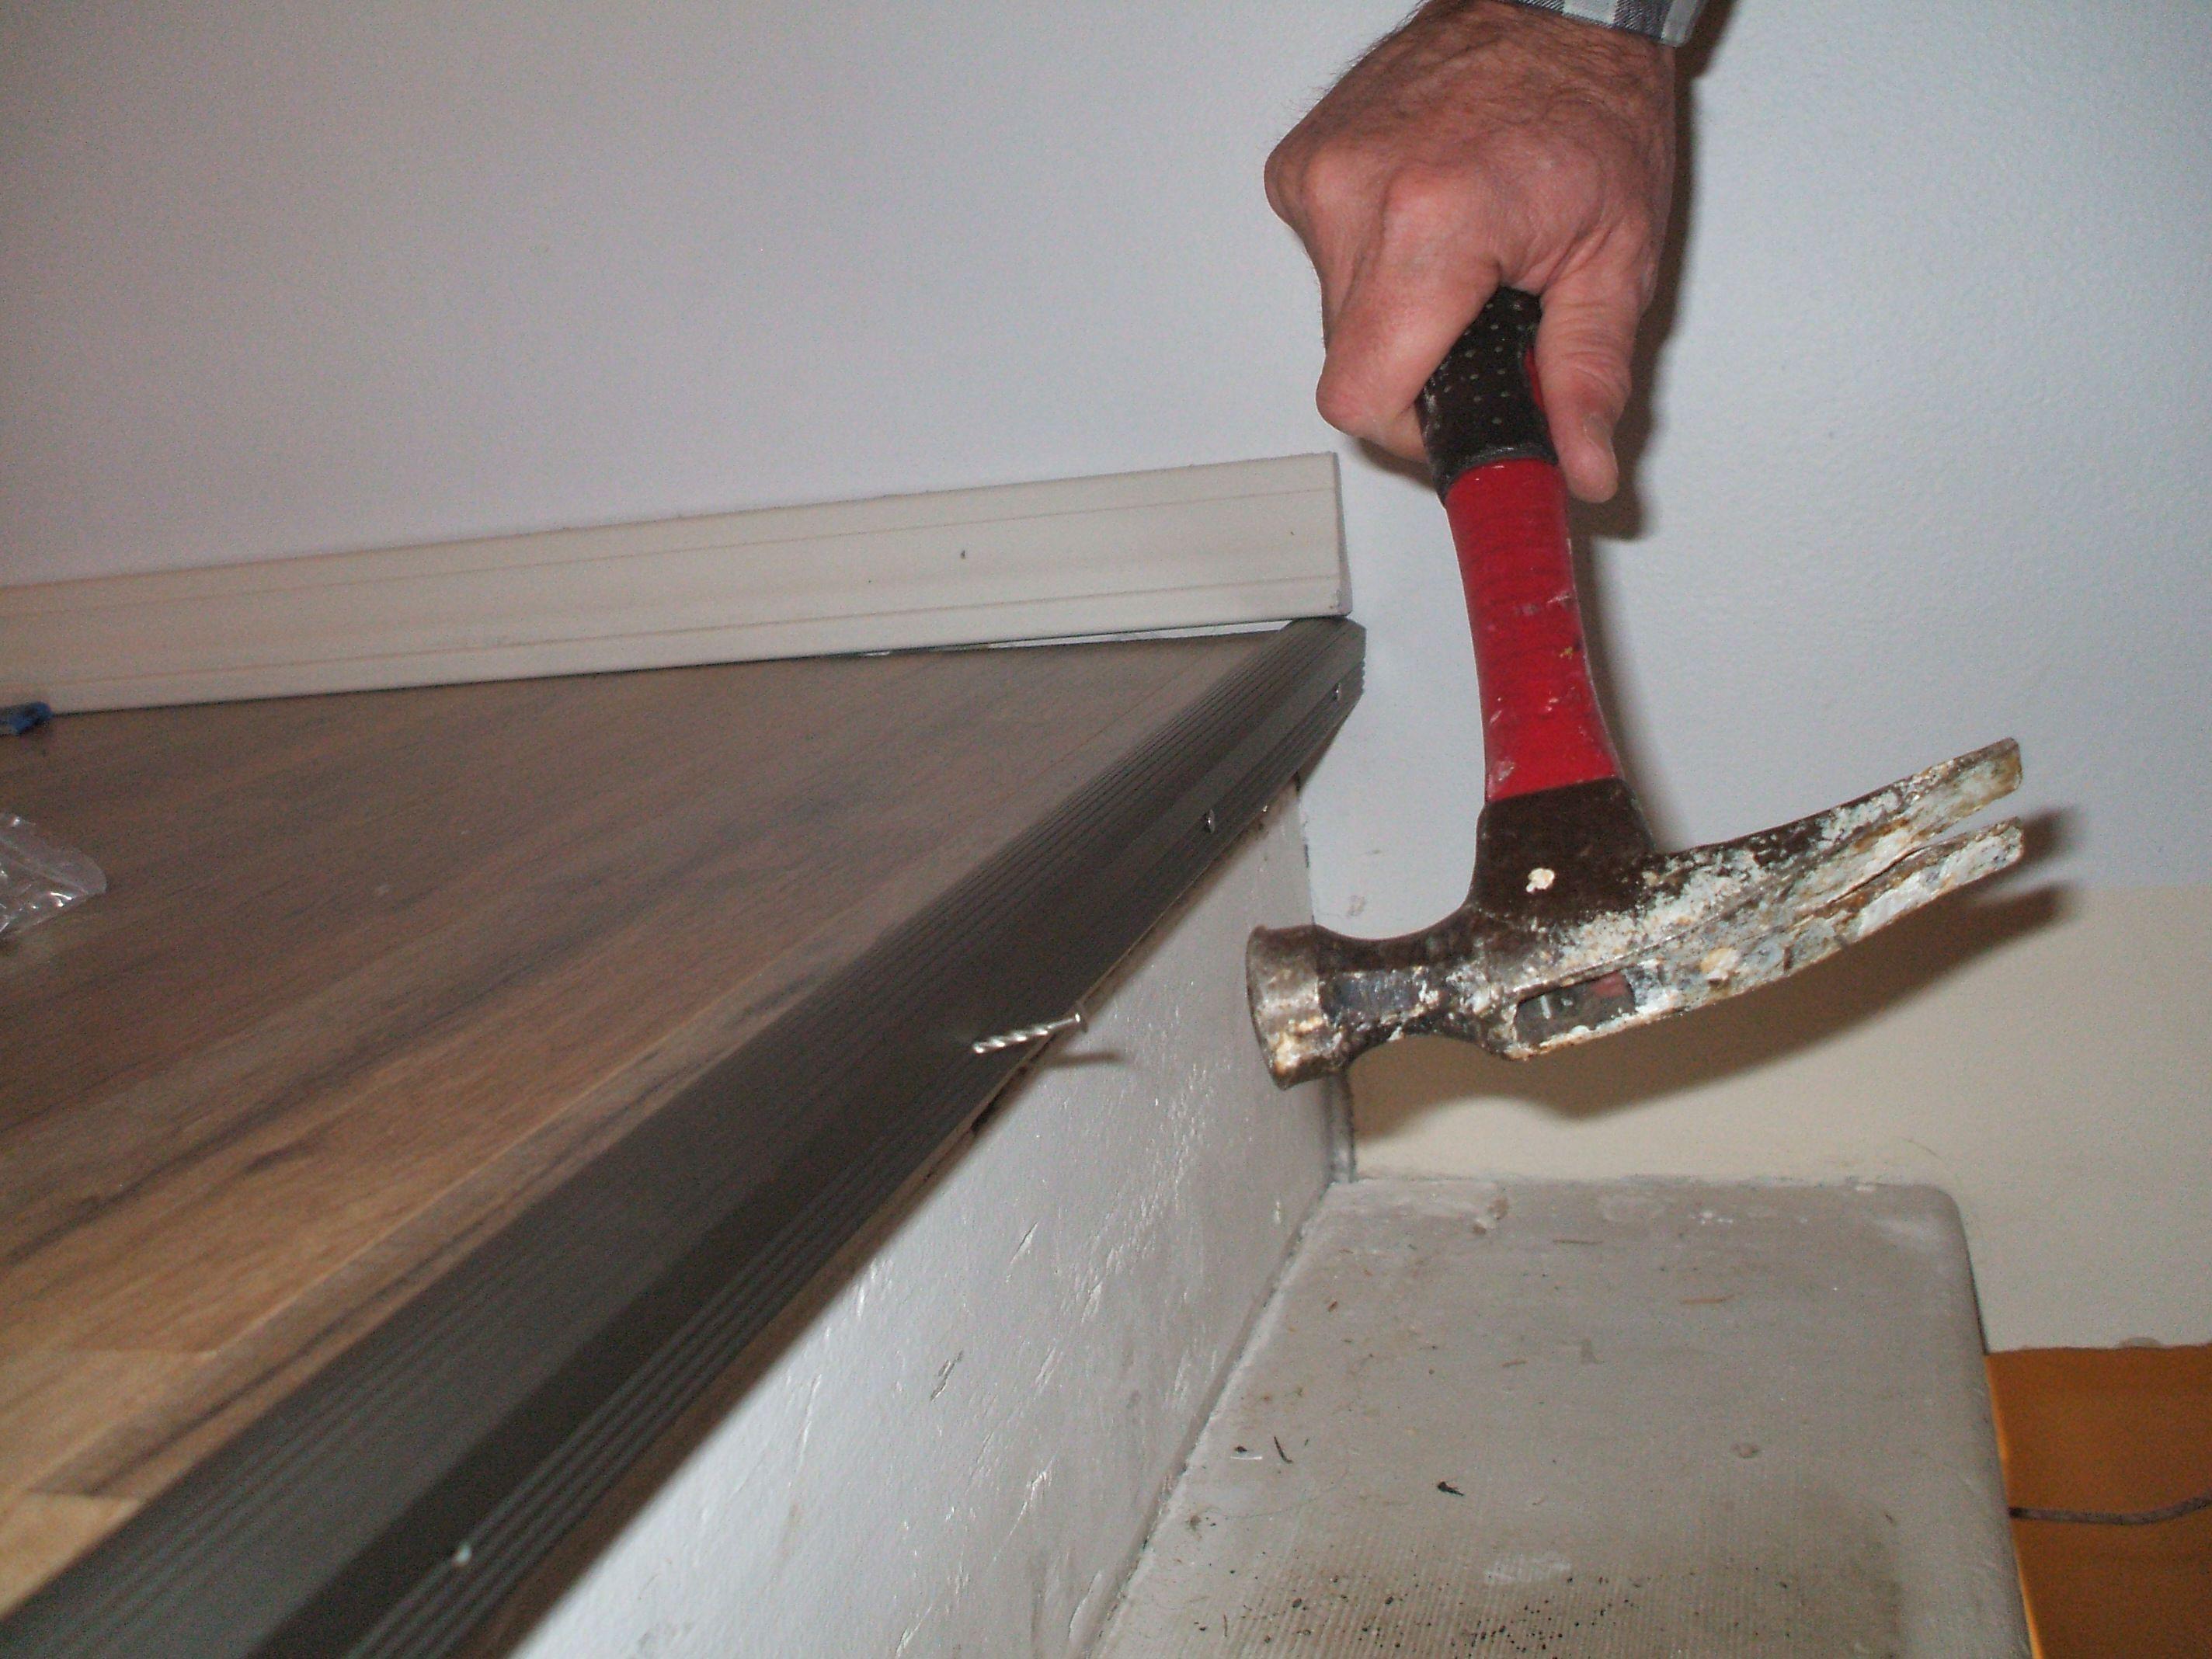 hardwood floor repair orlando of how to install a stair nosing strip inside nailing at an angle 56a49e5e3df78cf772834b67 jpg